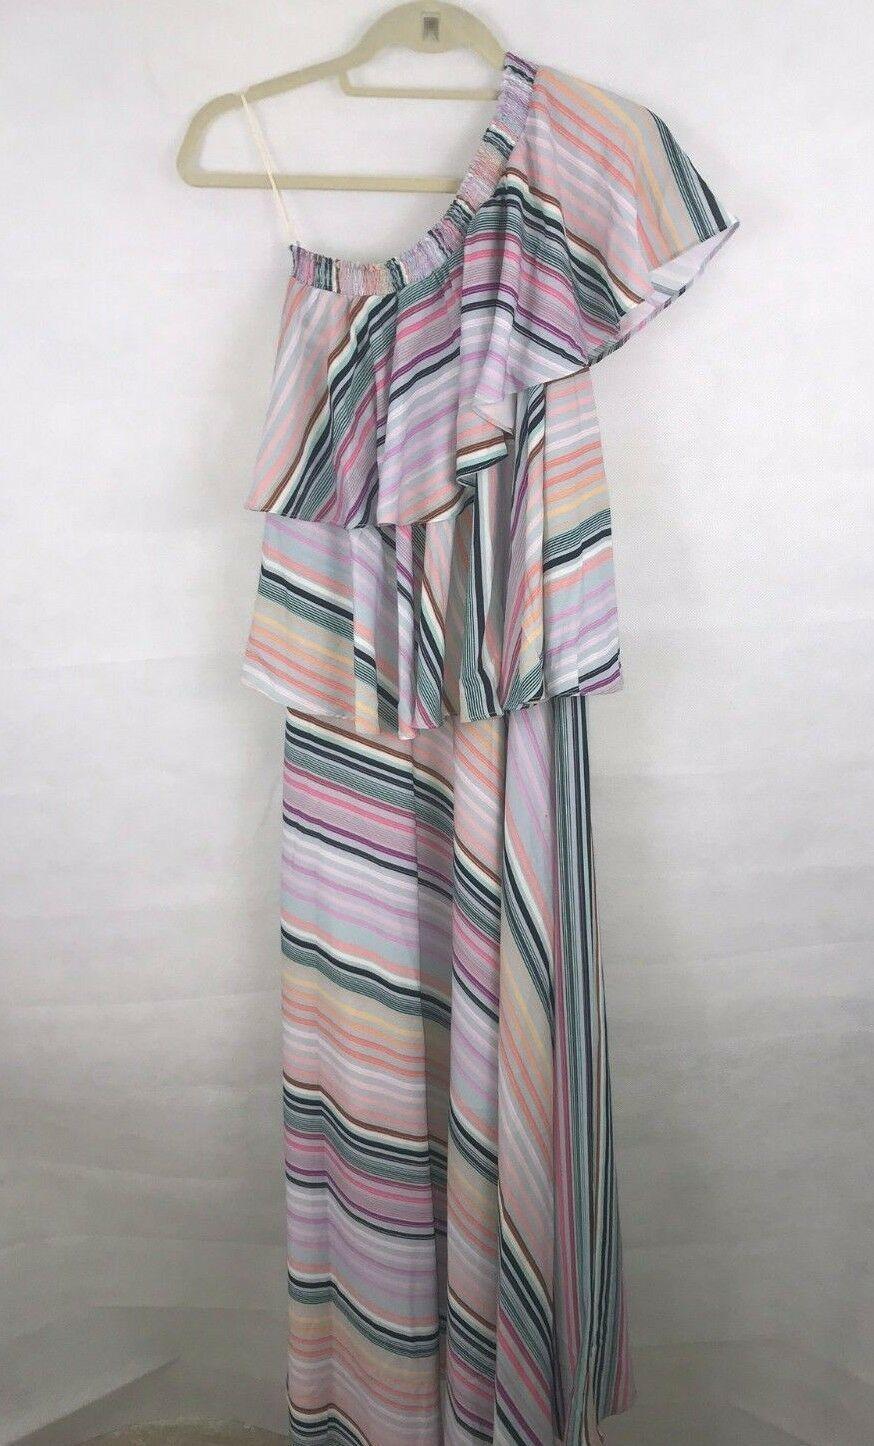 Anthropologie Rainbow Ruffled Maxi Dress by Guapa $258 - NWT